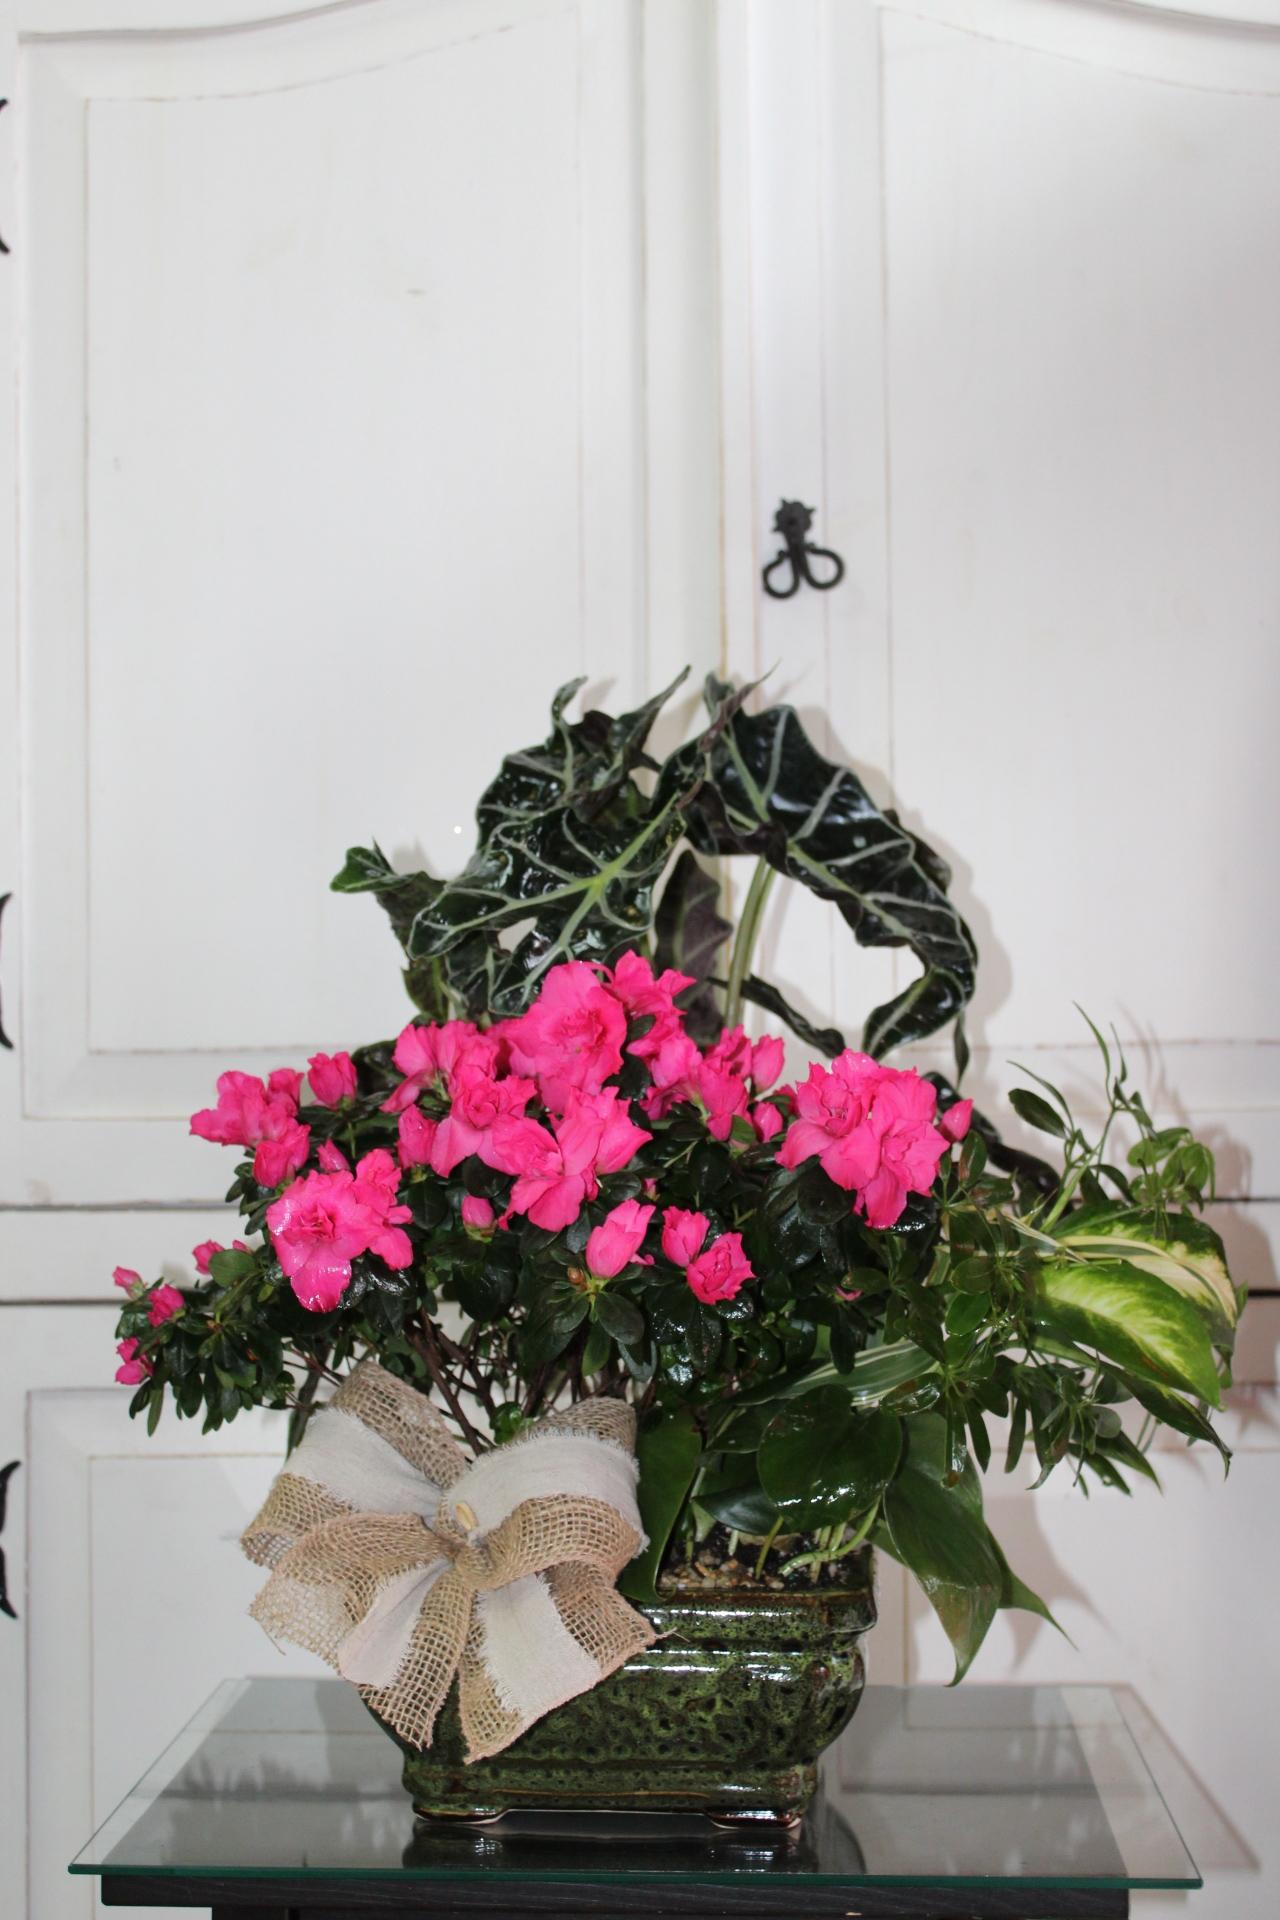 GP-910. Blooming Dishgarden.$69.99